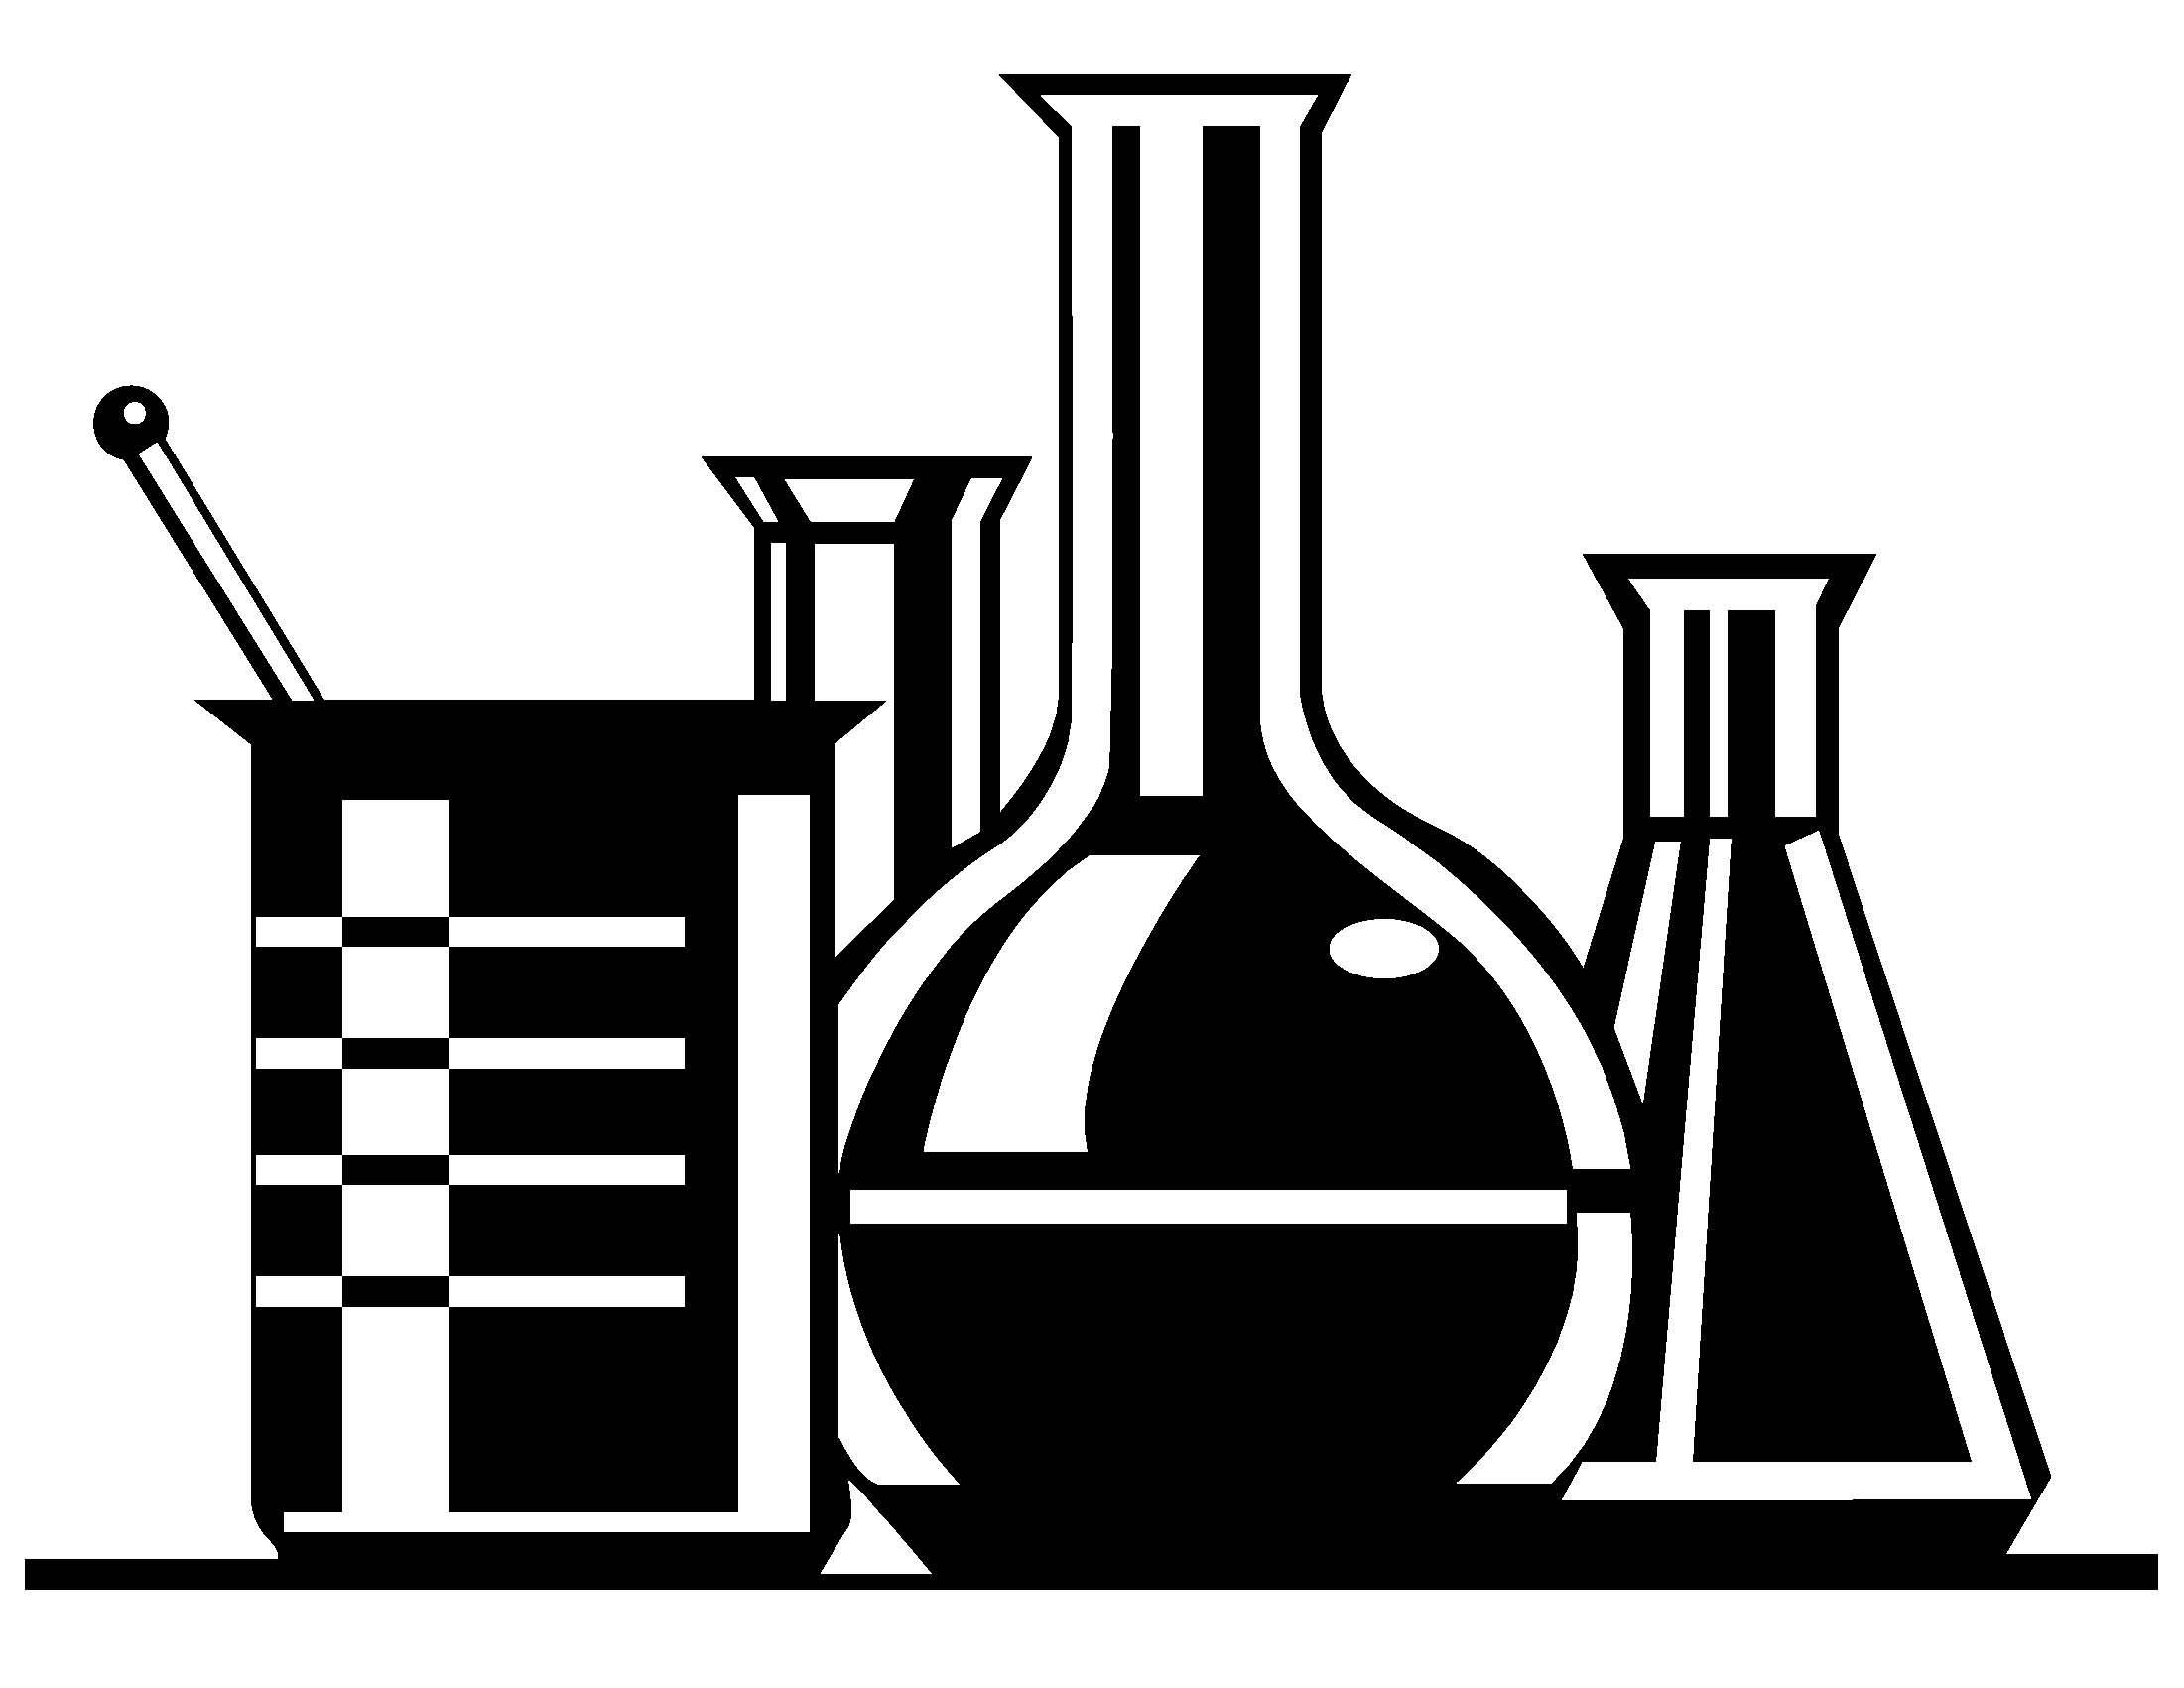 Beaker clipart science tool. Trendy design ideas black